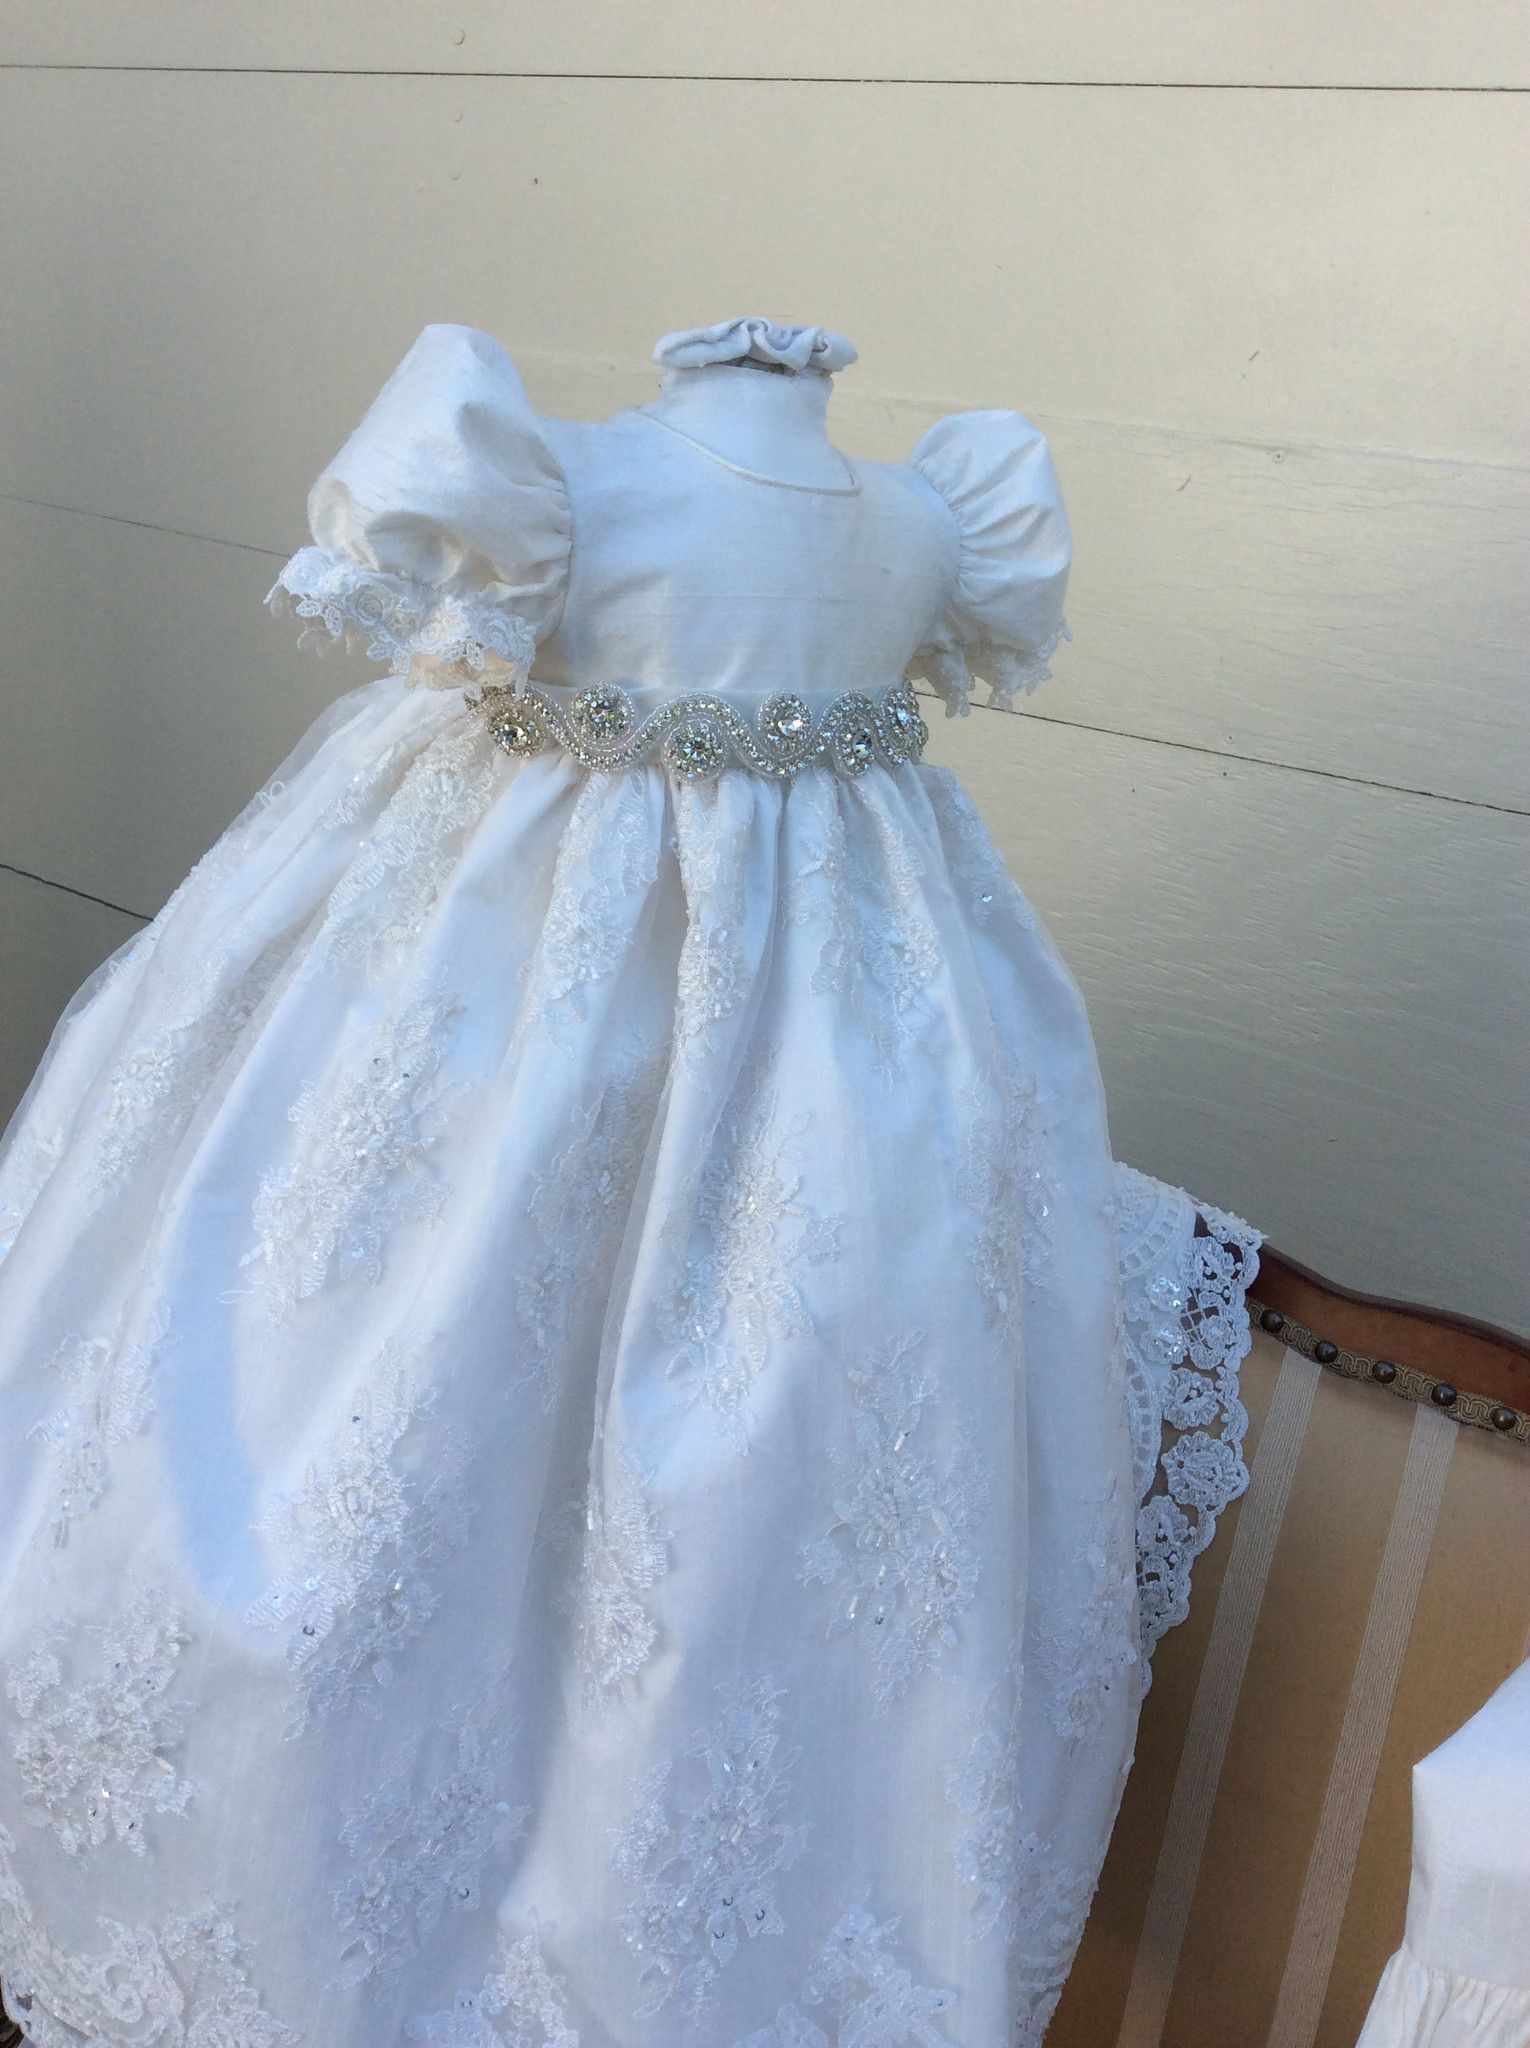 Dupioni silk dress with crystal sash and double ruffle sleeve ...